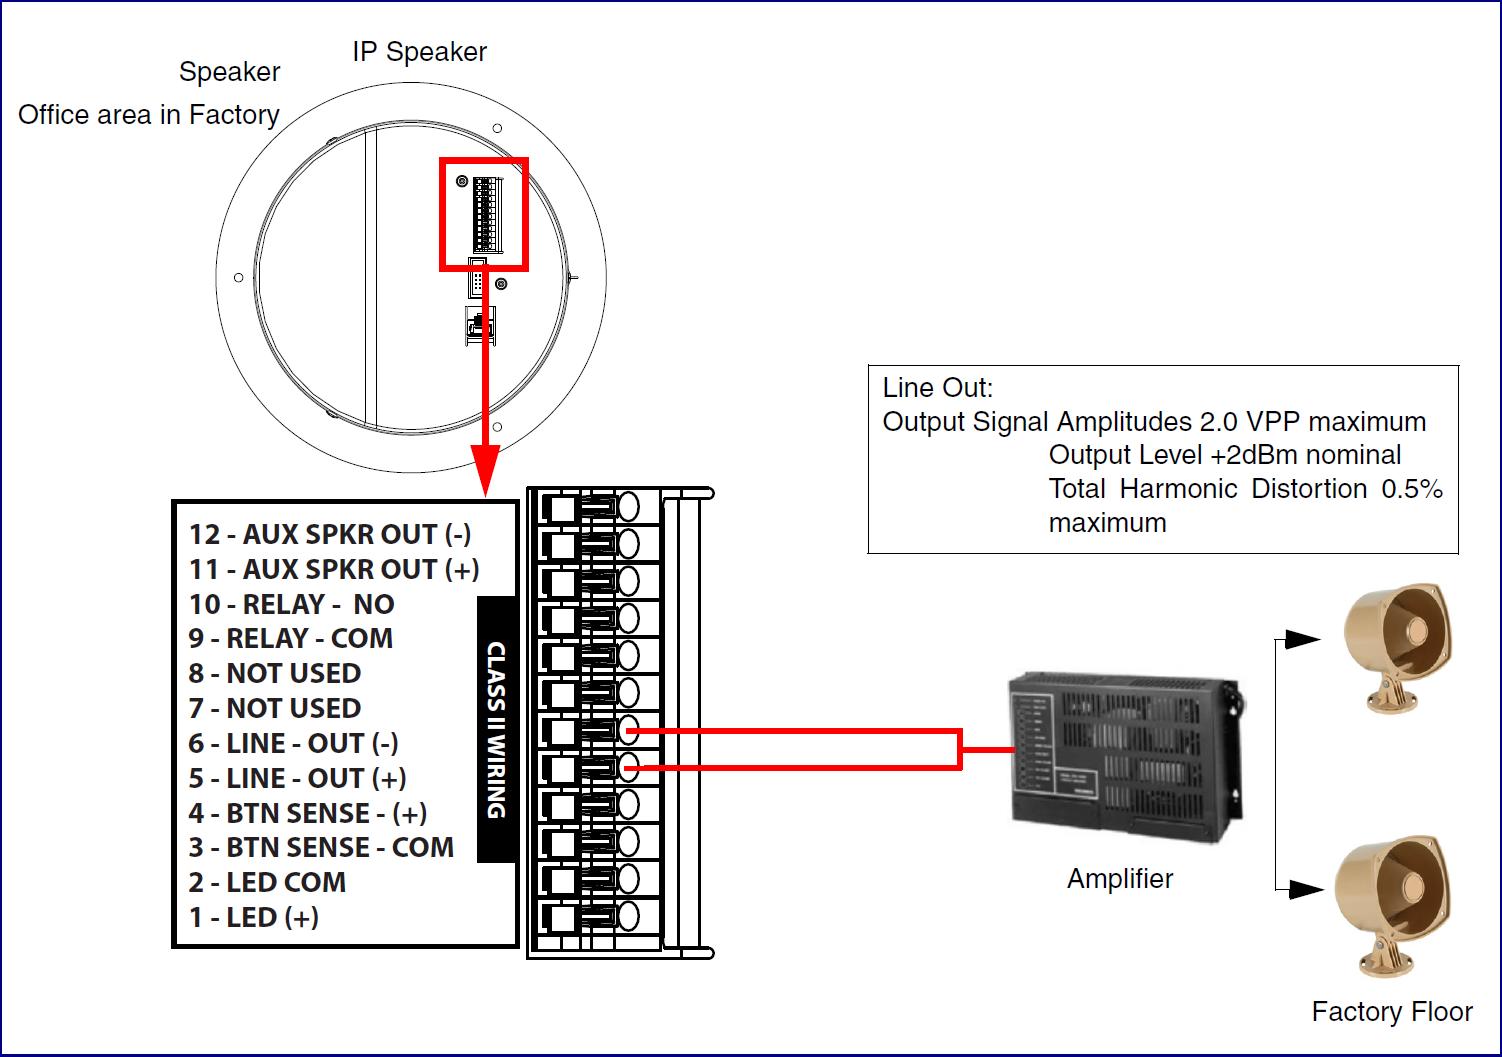 011395 011396 Singlewire Informacast Speaker Cyberdata Corporation Class 2 Audio Wiring Ceiling Mounting